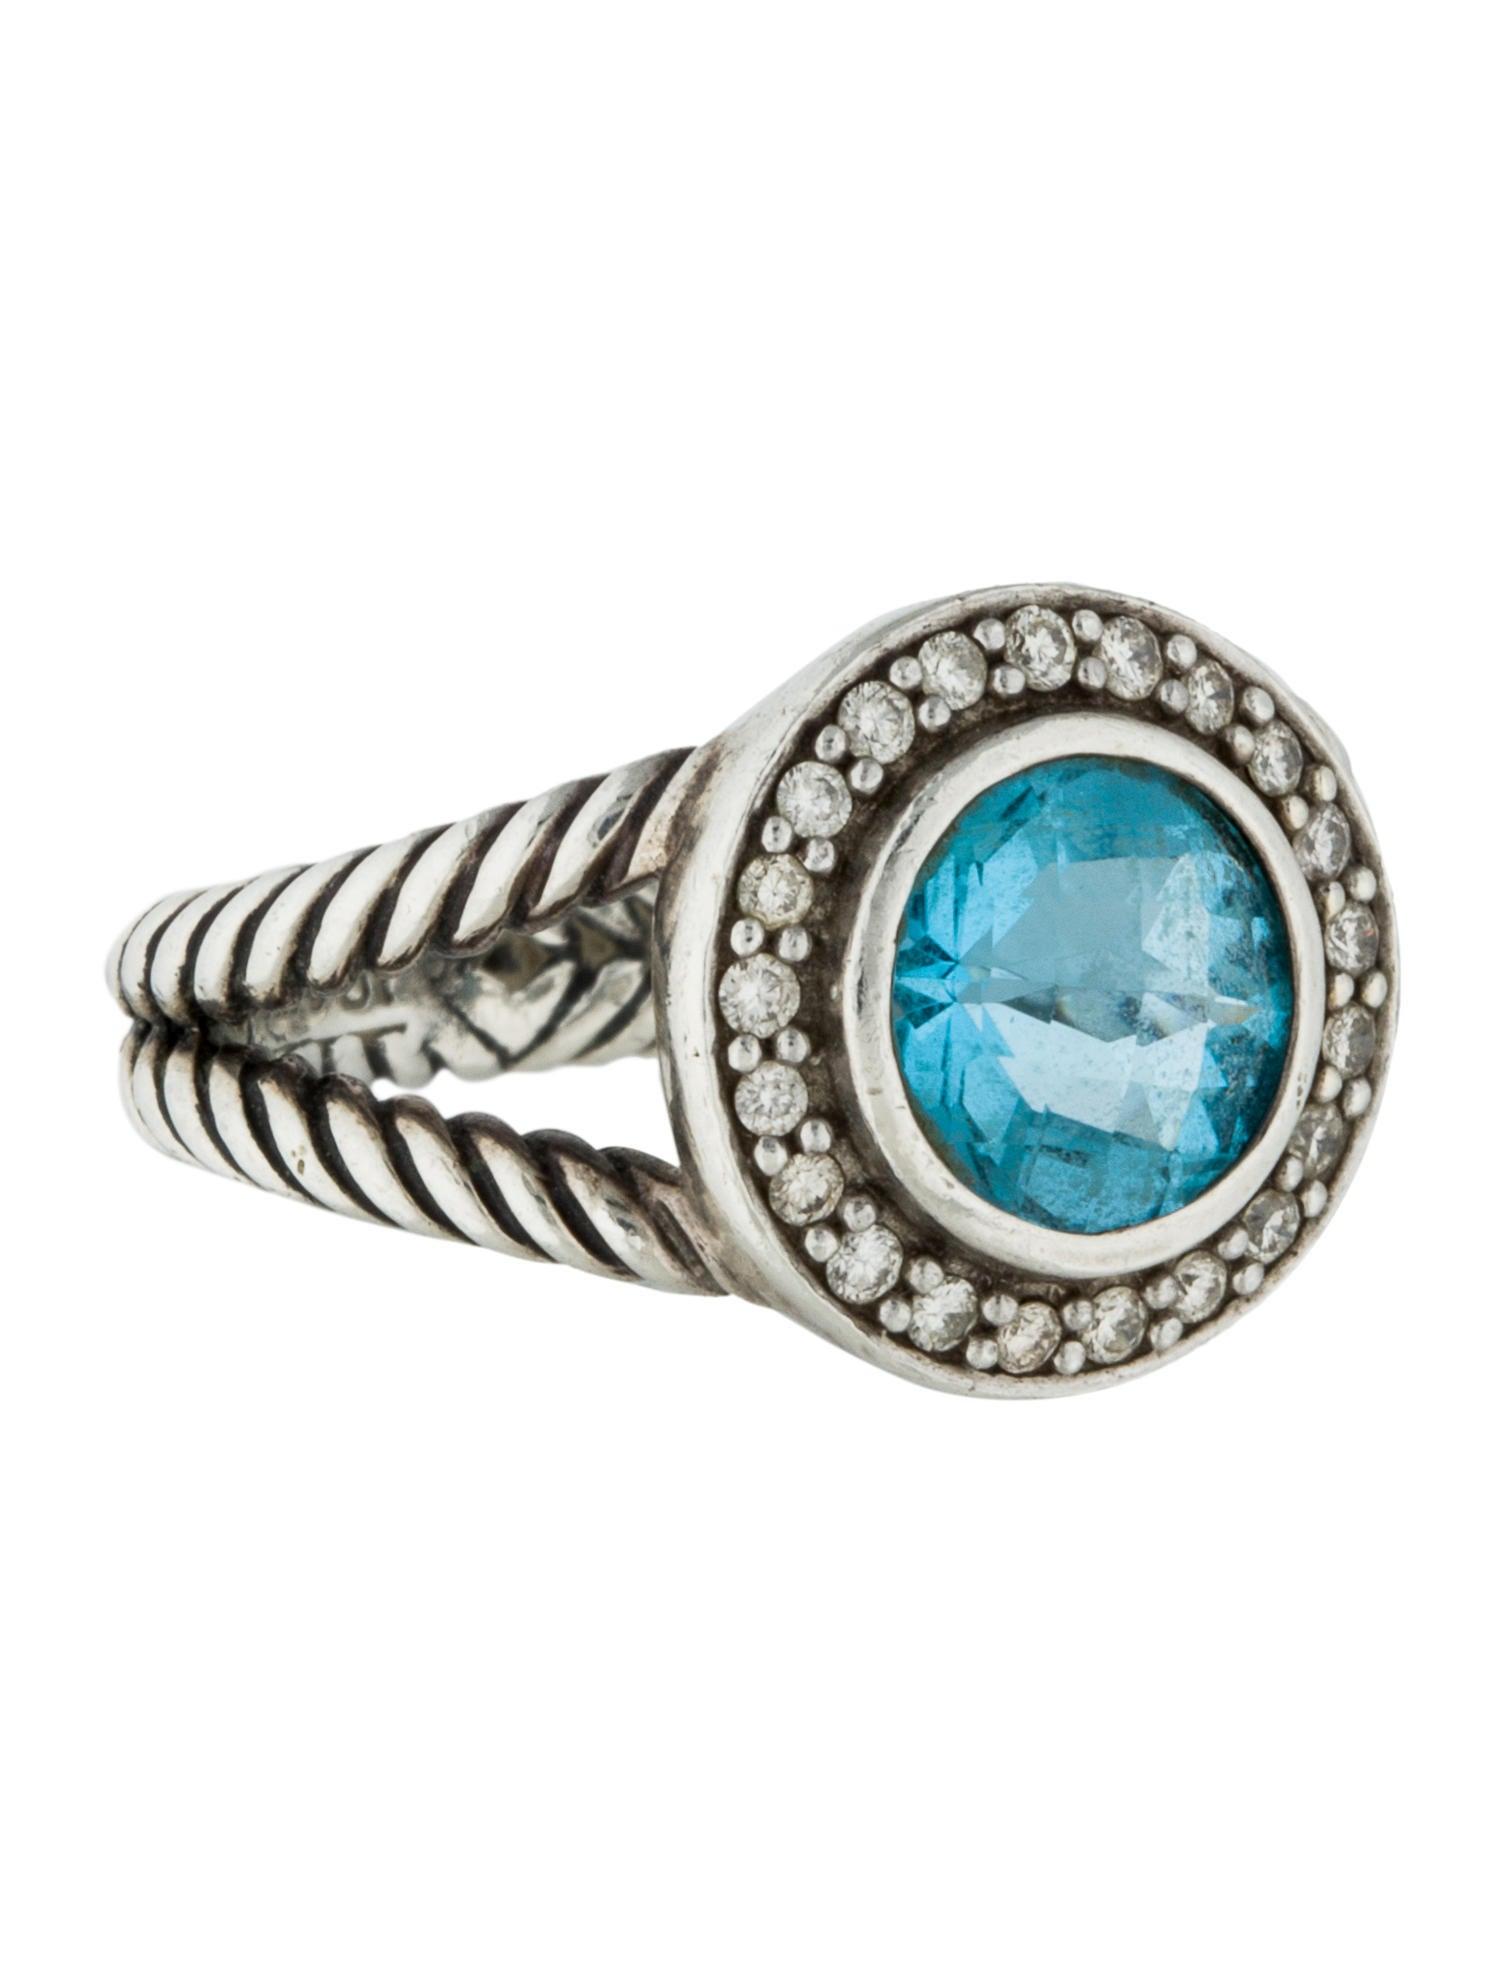 David yurman blue topaz diamond cerise ring rings for David yurman inspired jewelry rings